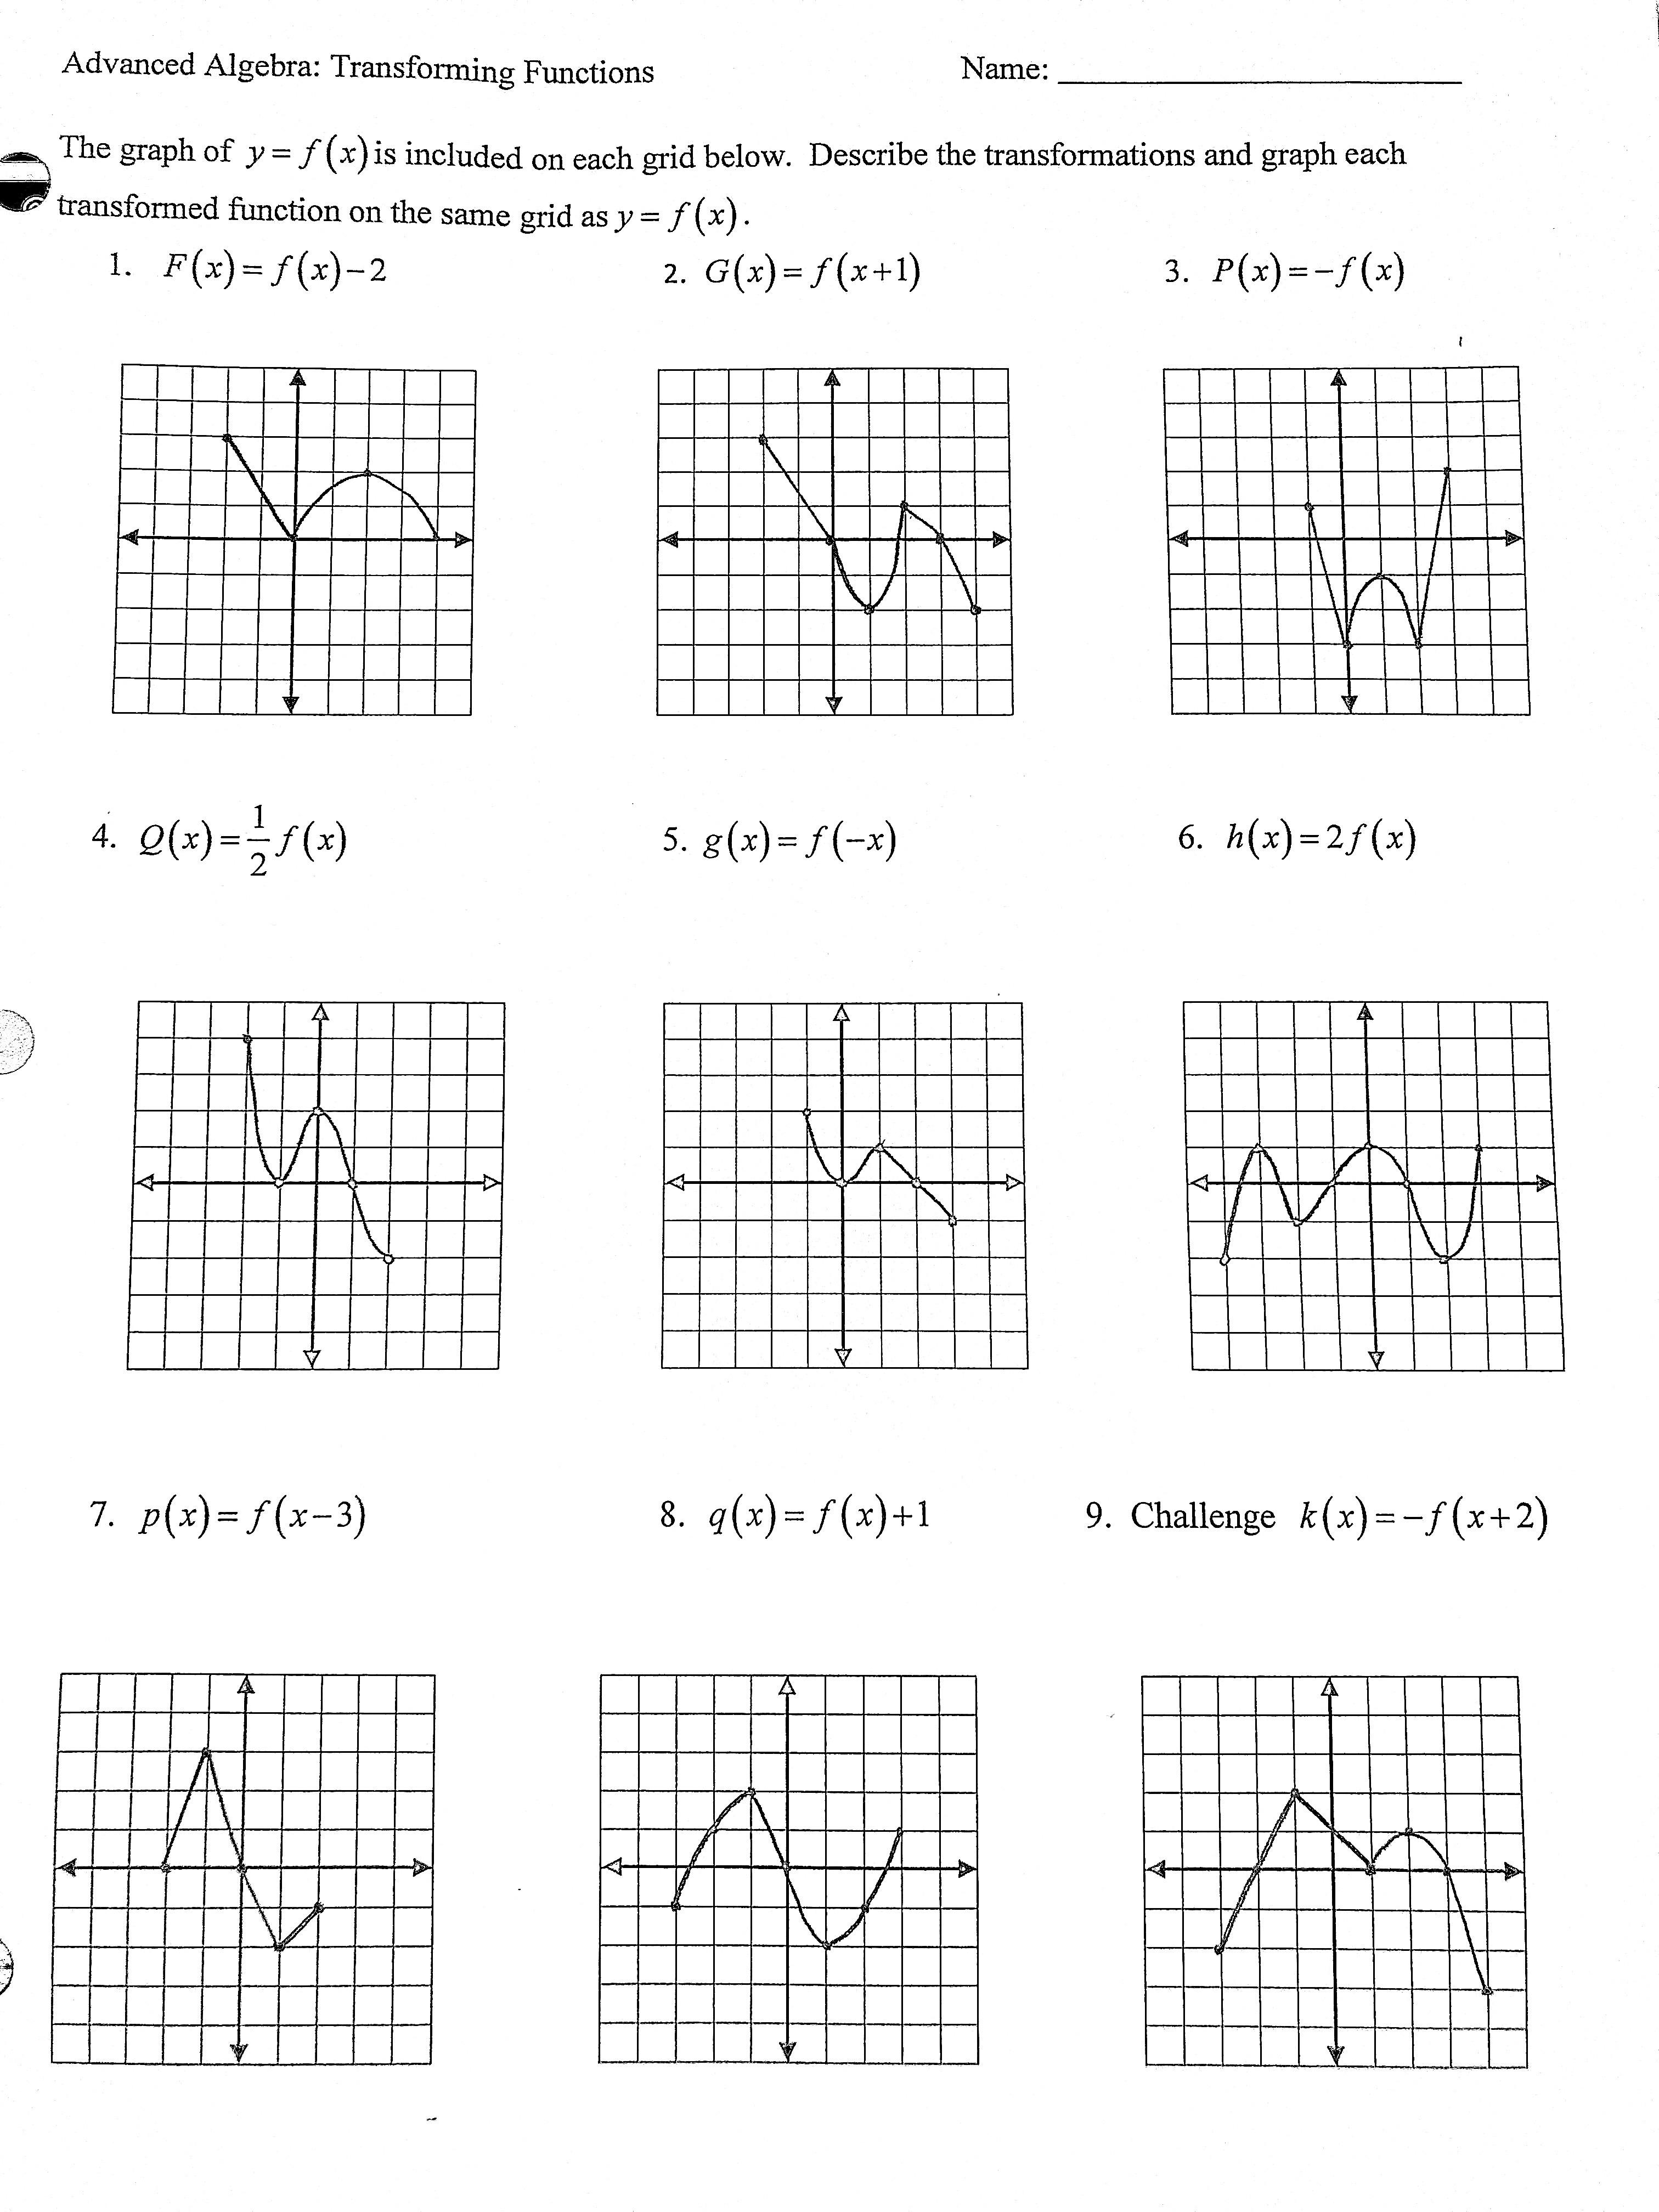 Detore Grace Adv Algebra